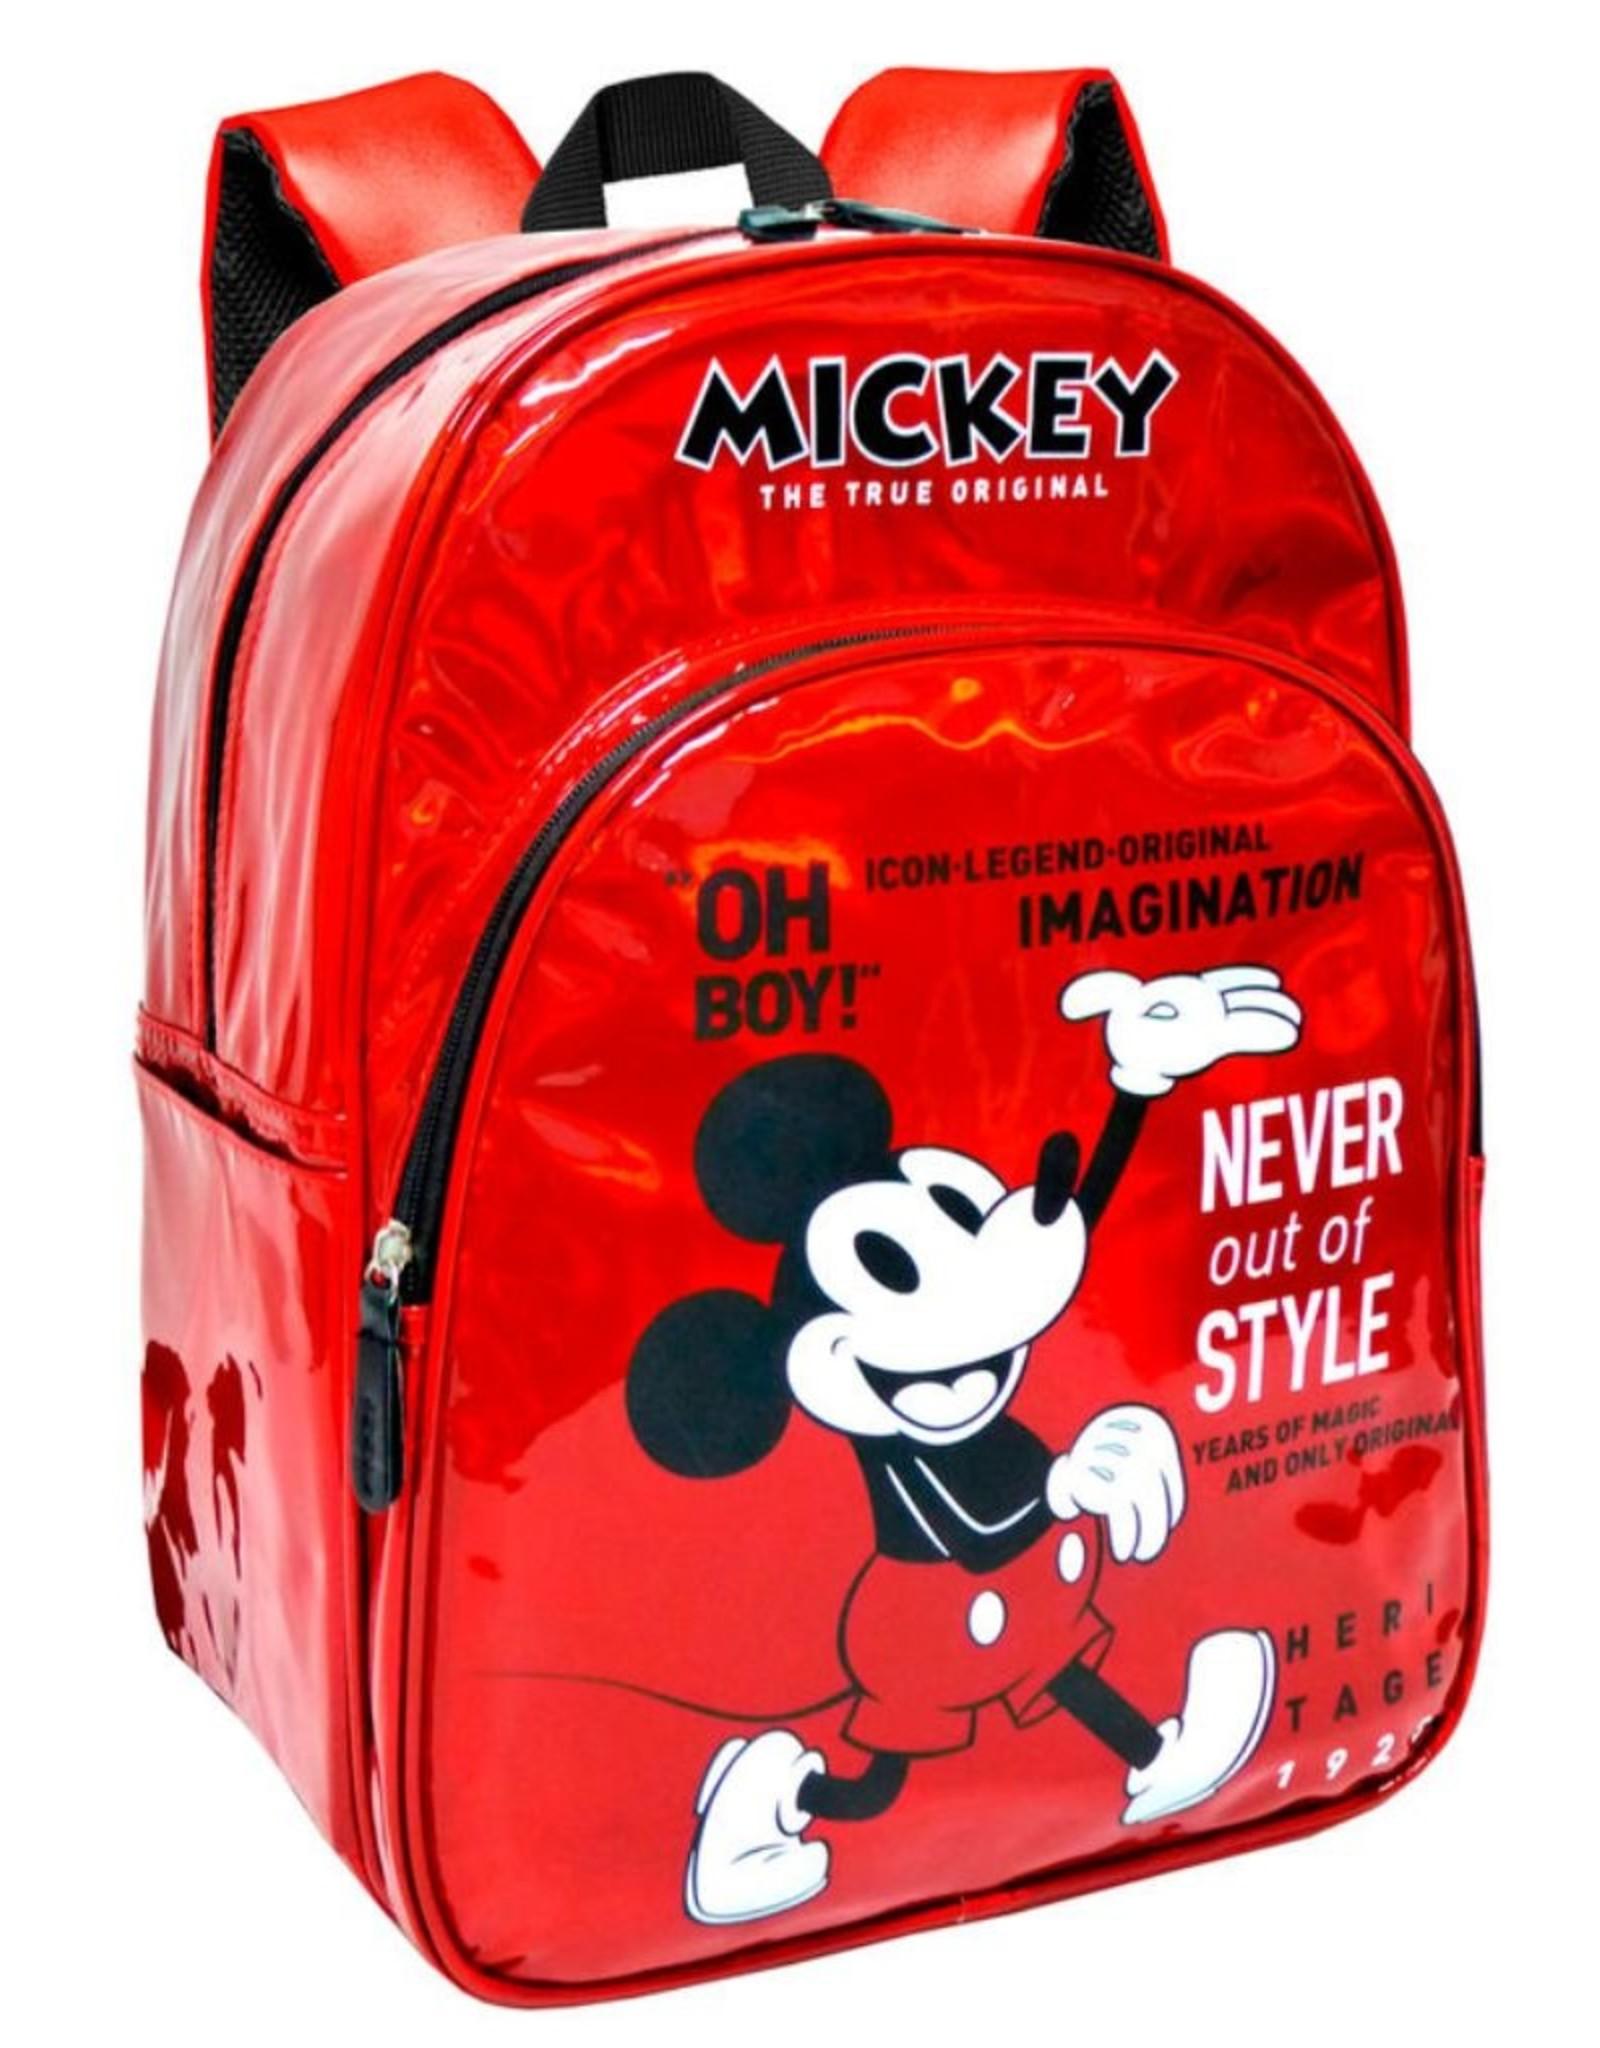 ToyBags Disney tassen - Mickey 90 Jaar Holografische Disney rugzak 40cm